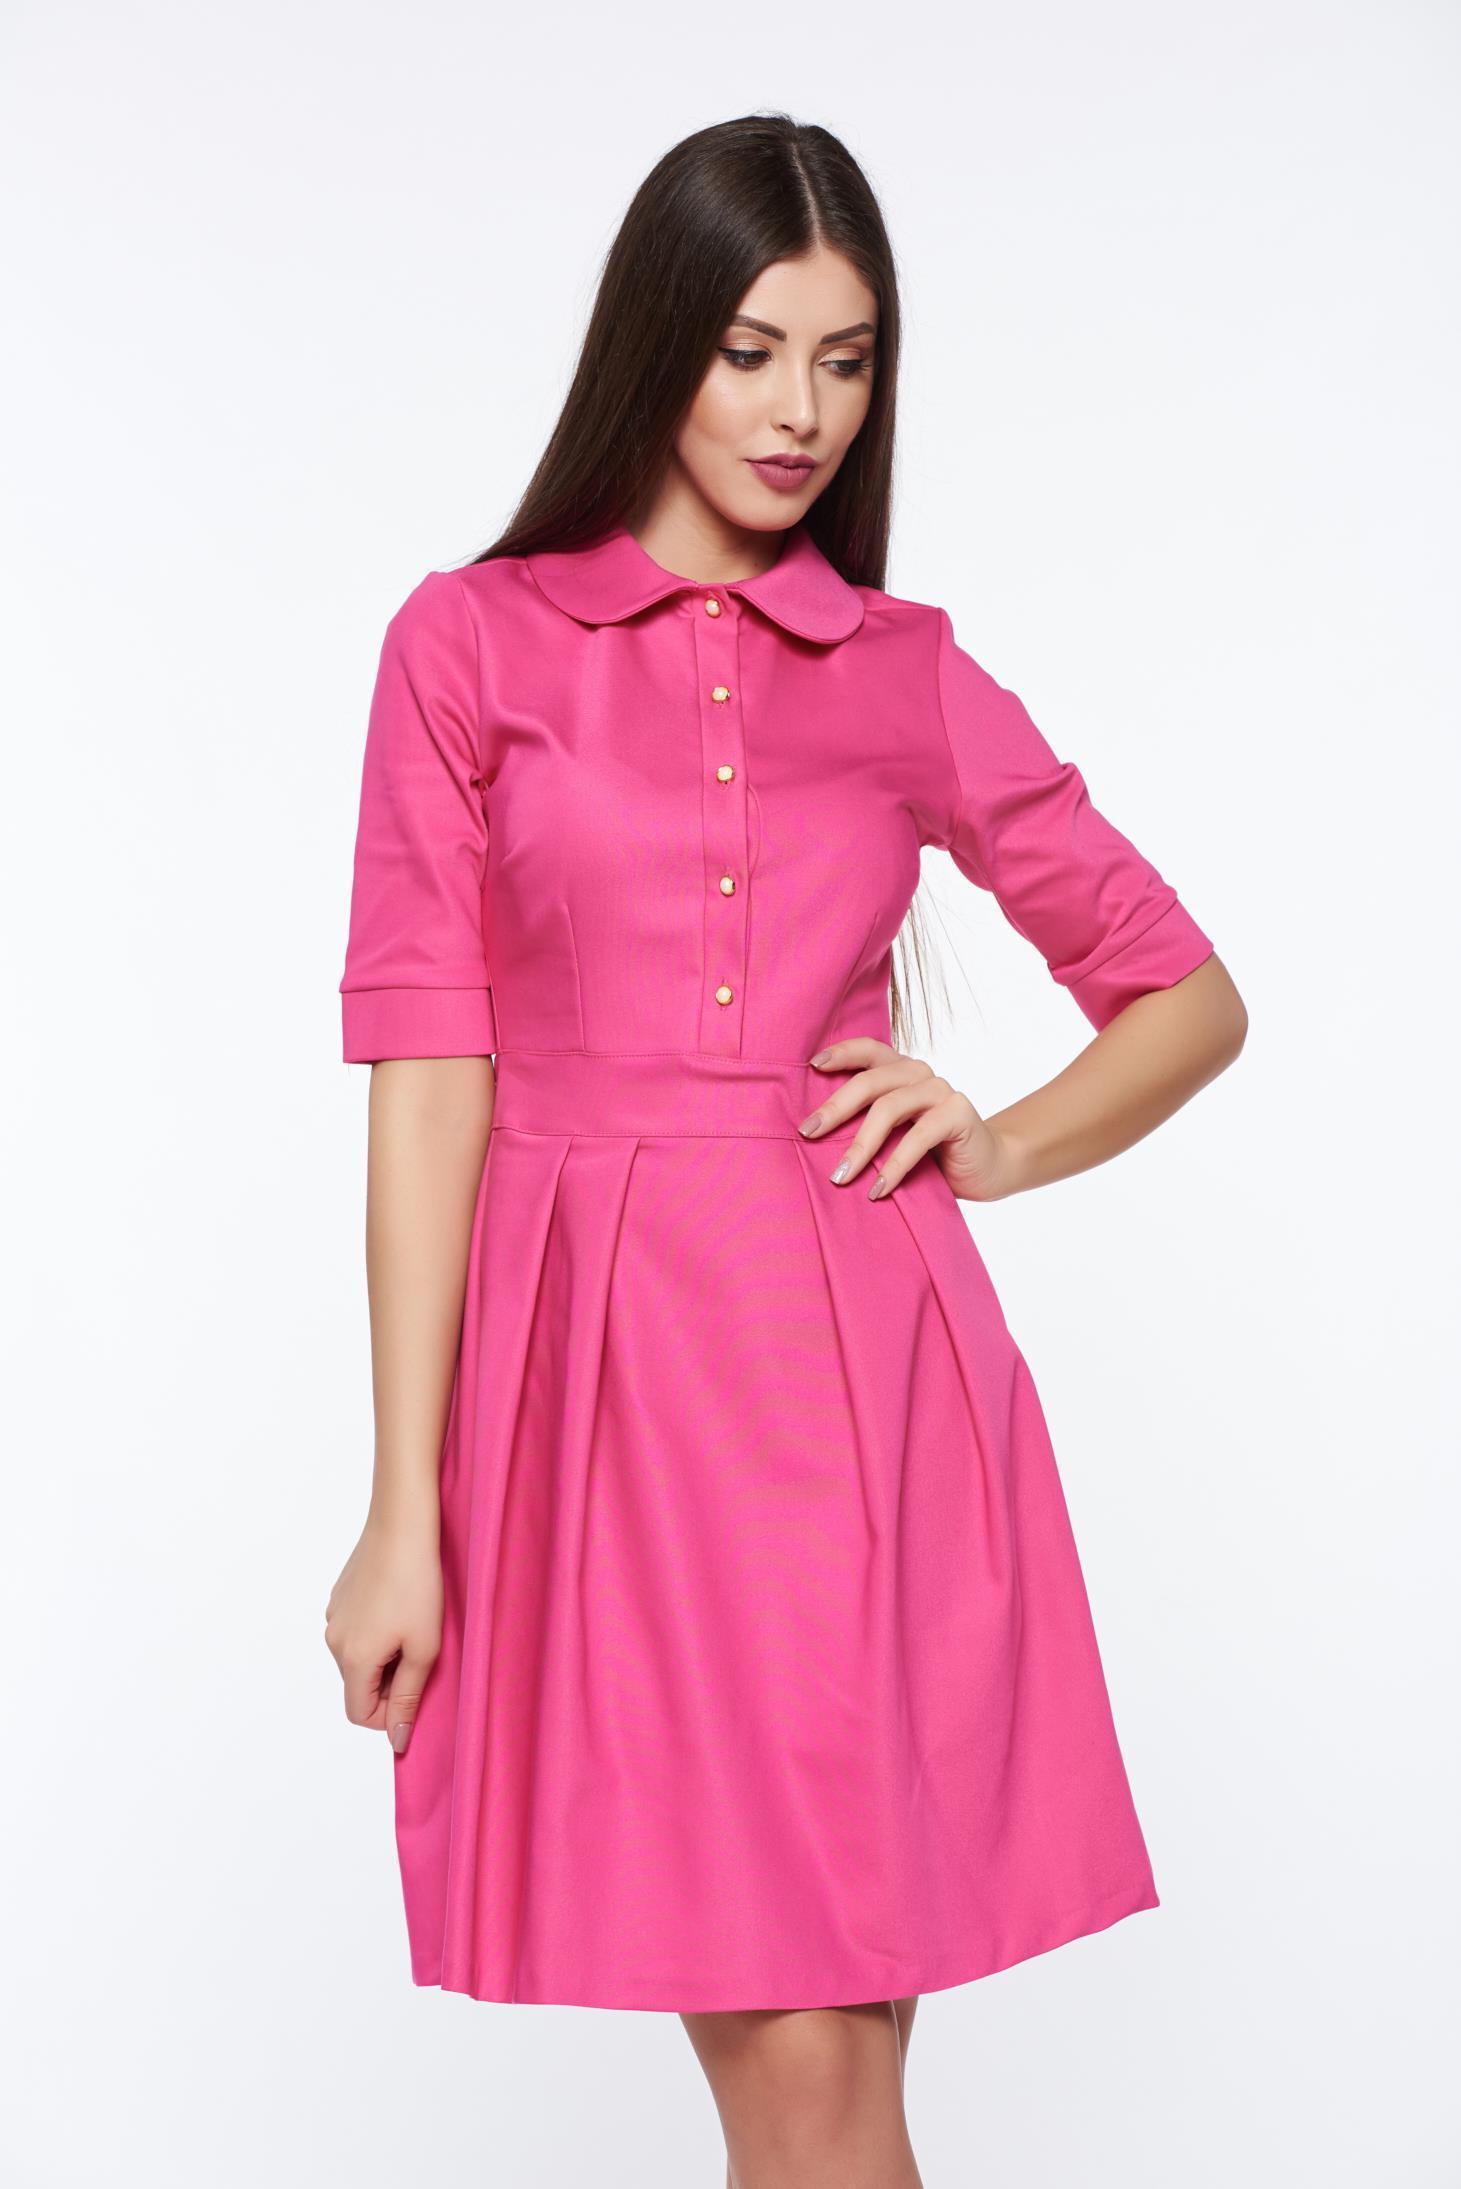 PrettyGirl fuchsia office cloche dress slightly elastic fabric with round collar